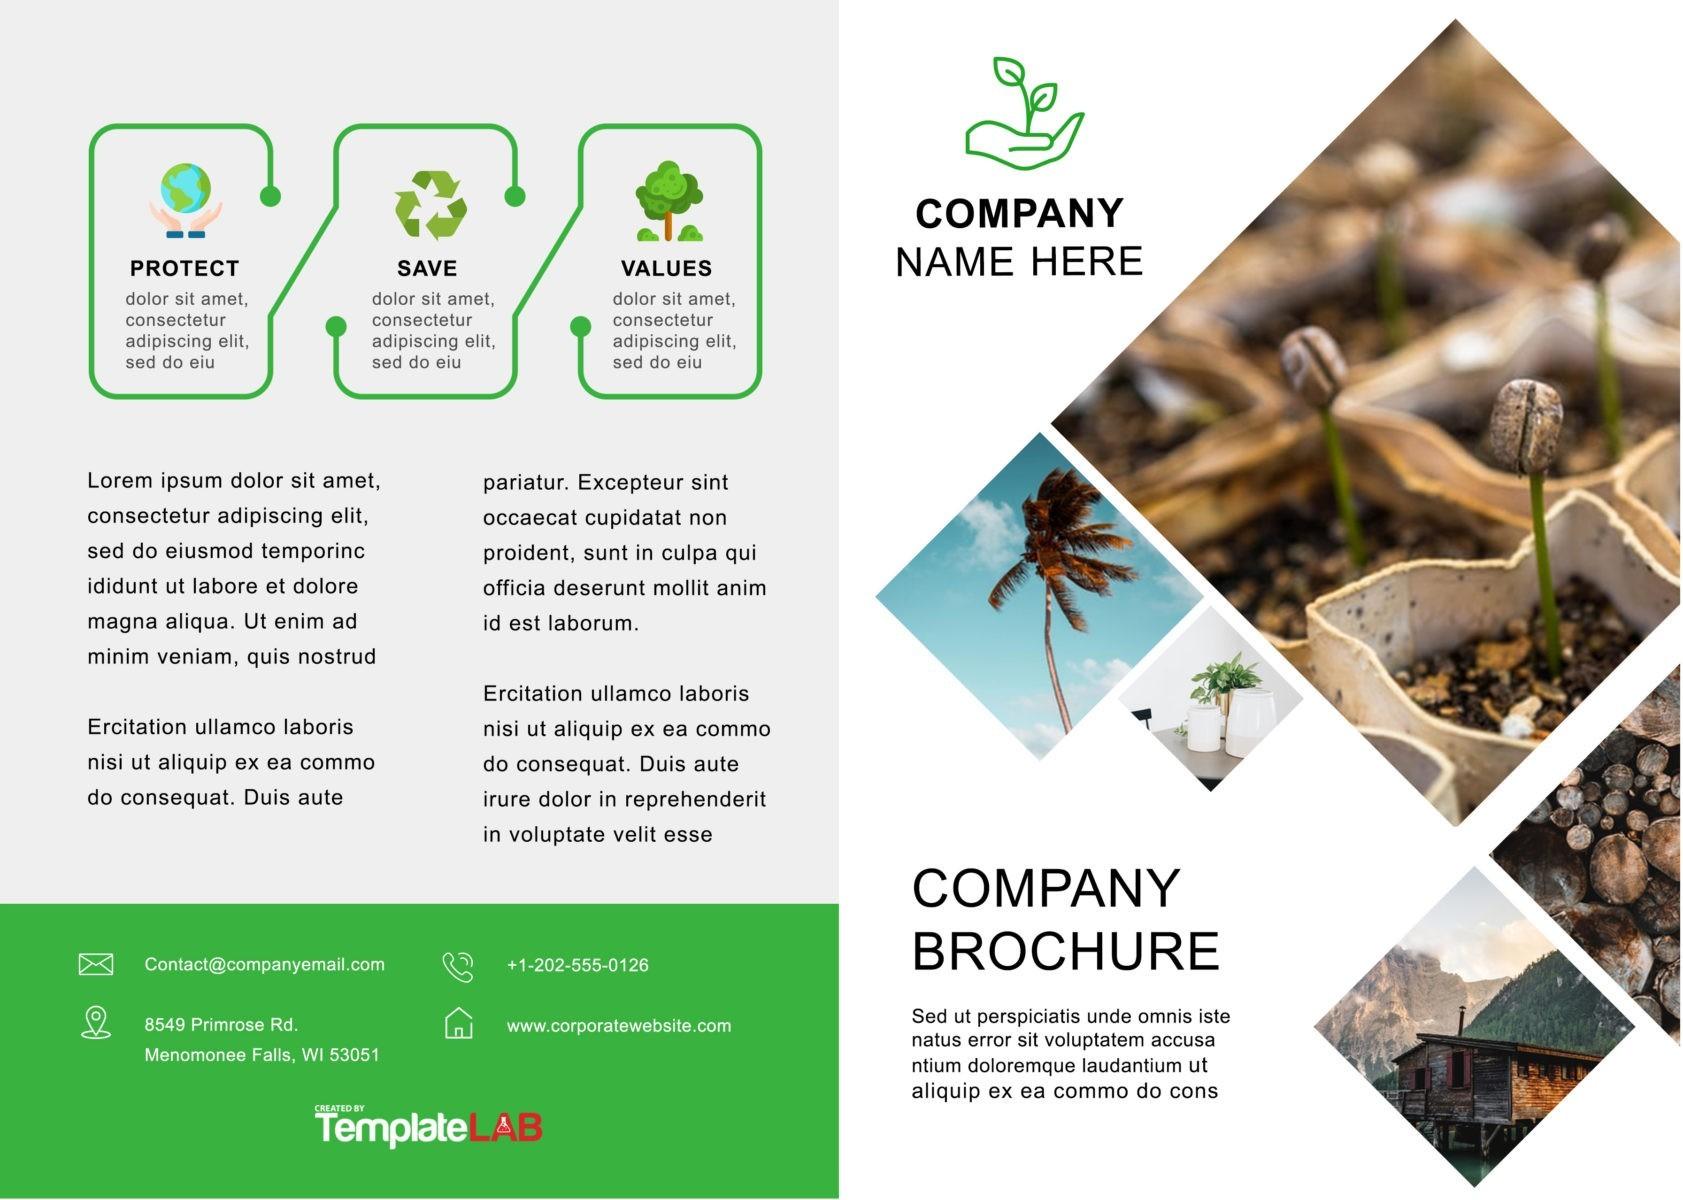 33 Free Brochure Templates Word Pdf ᐅ Templatelab